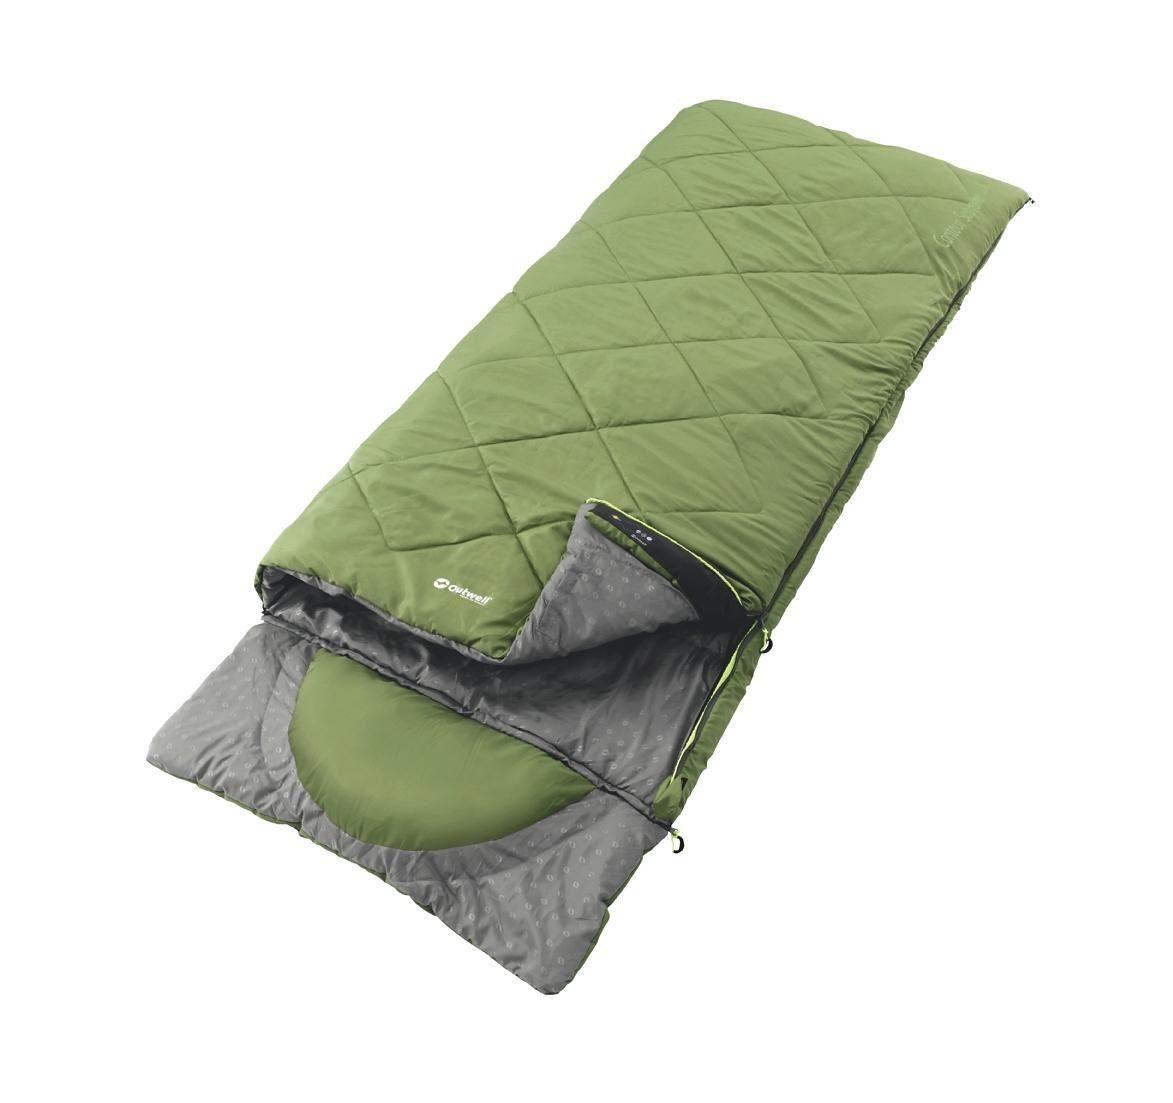 Outwell Wanderrucksack »Contour Supreme Sleeping Bag«